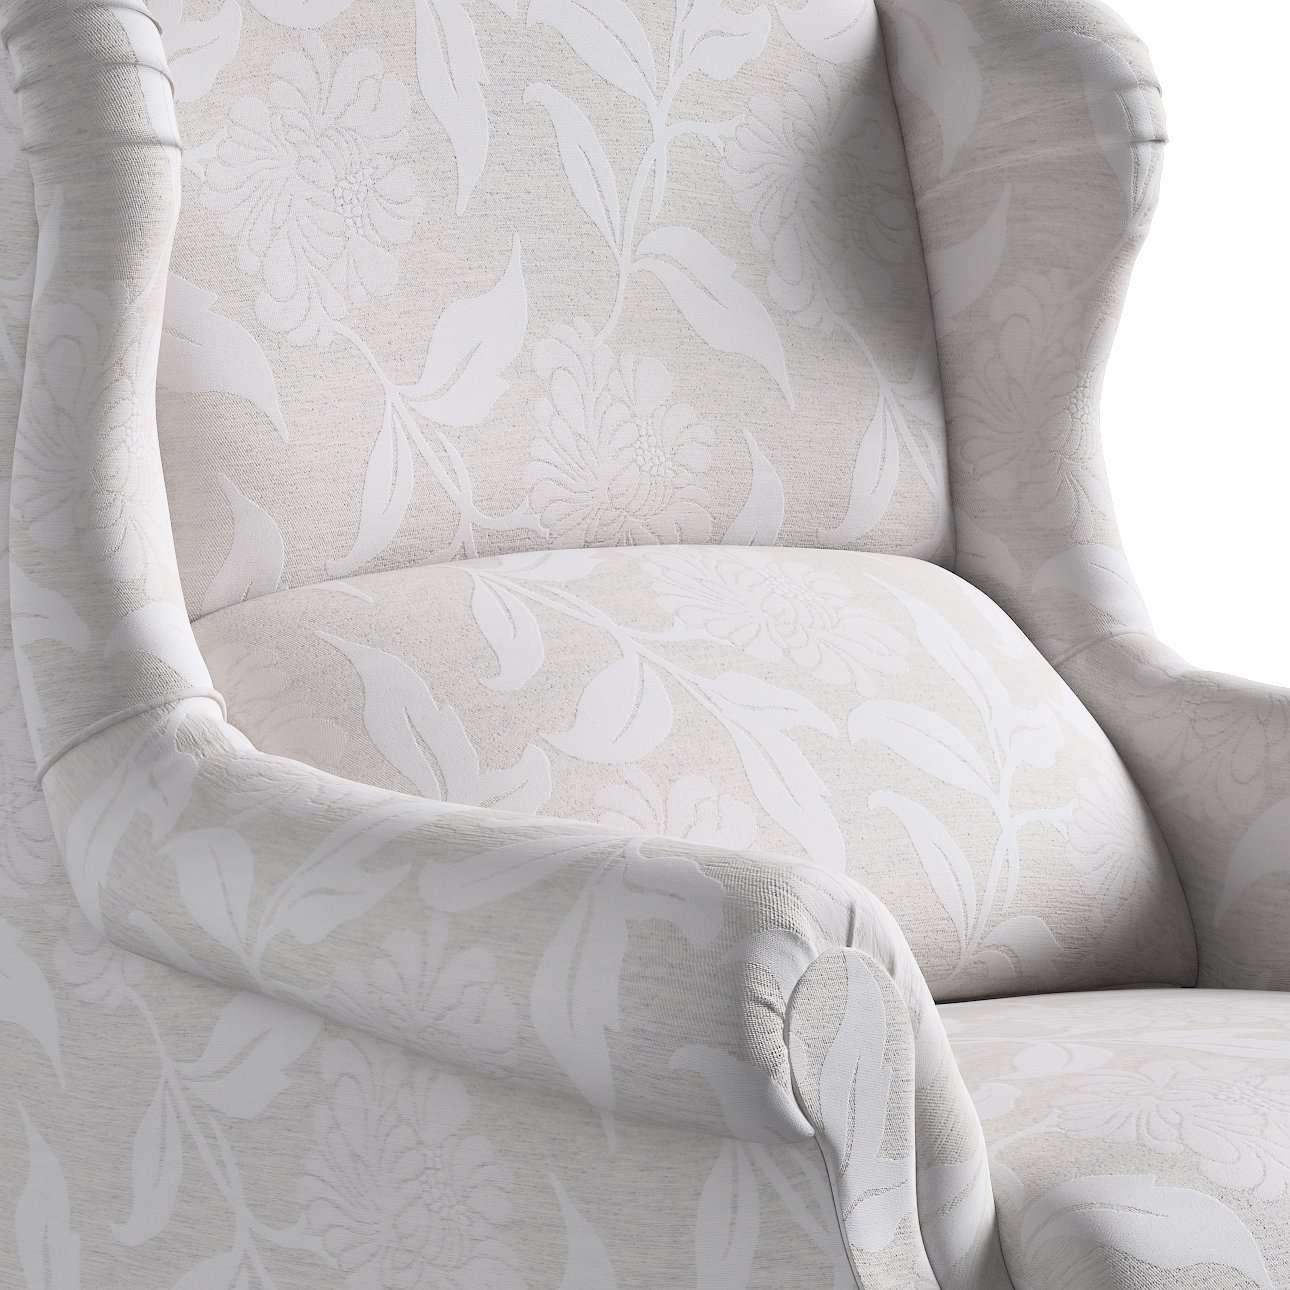 Fotel Unique w kolekcji Venice, tkanina: 140-51